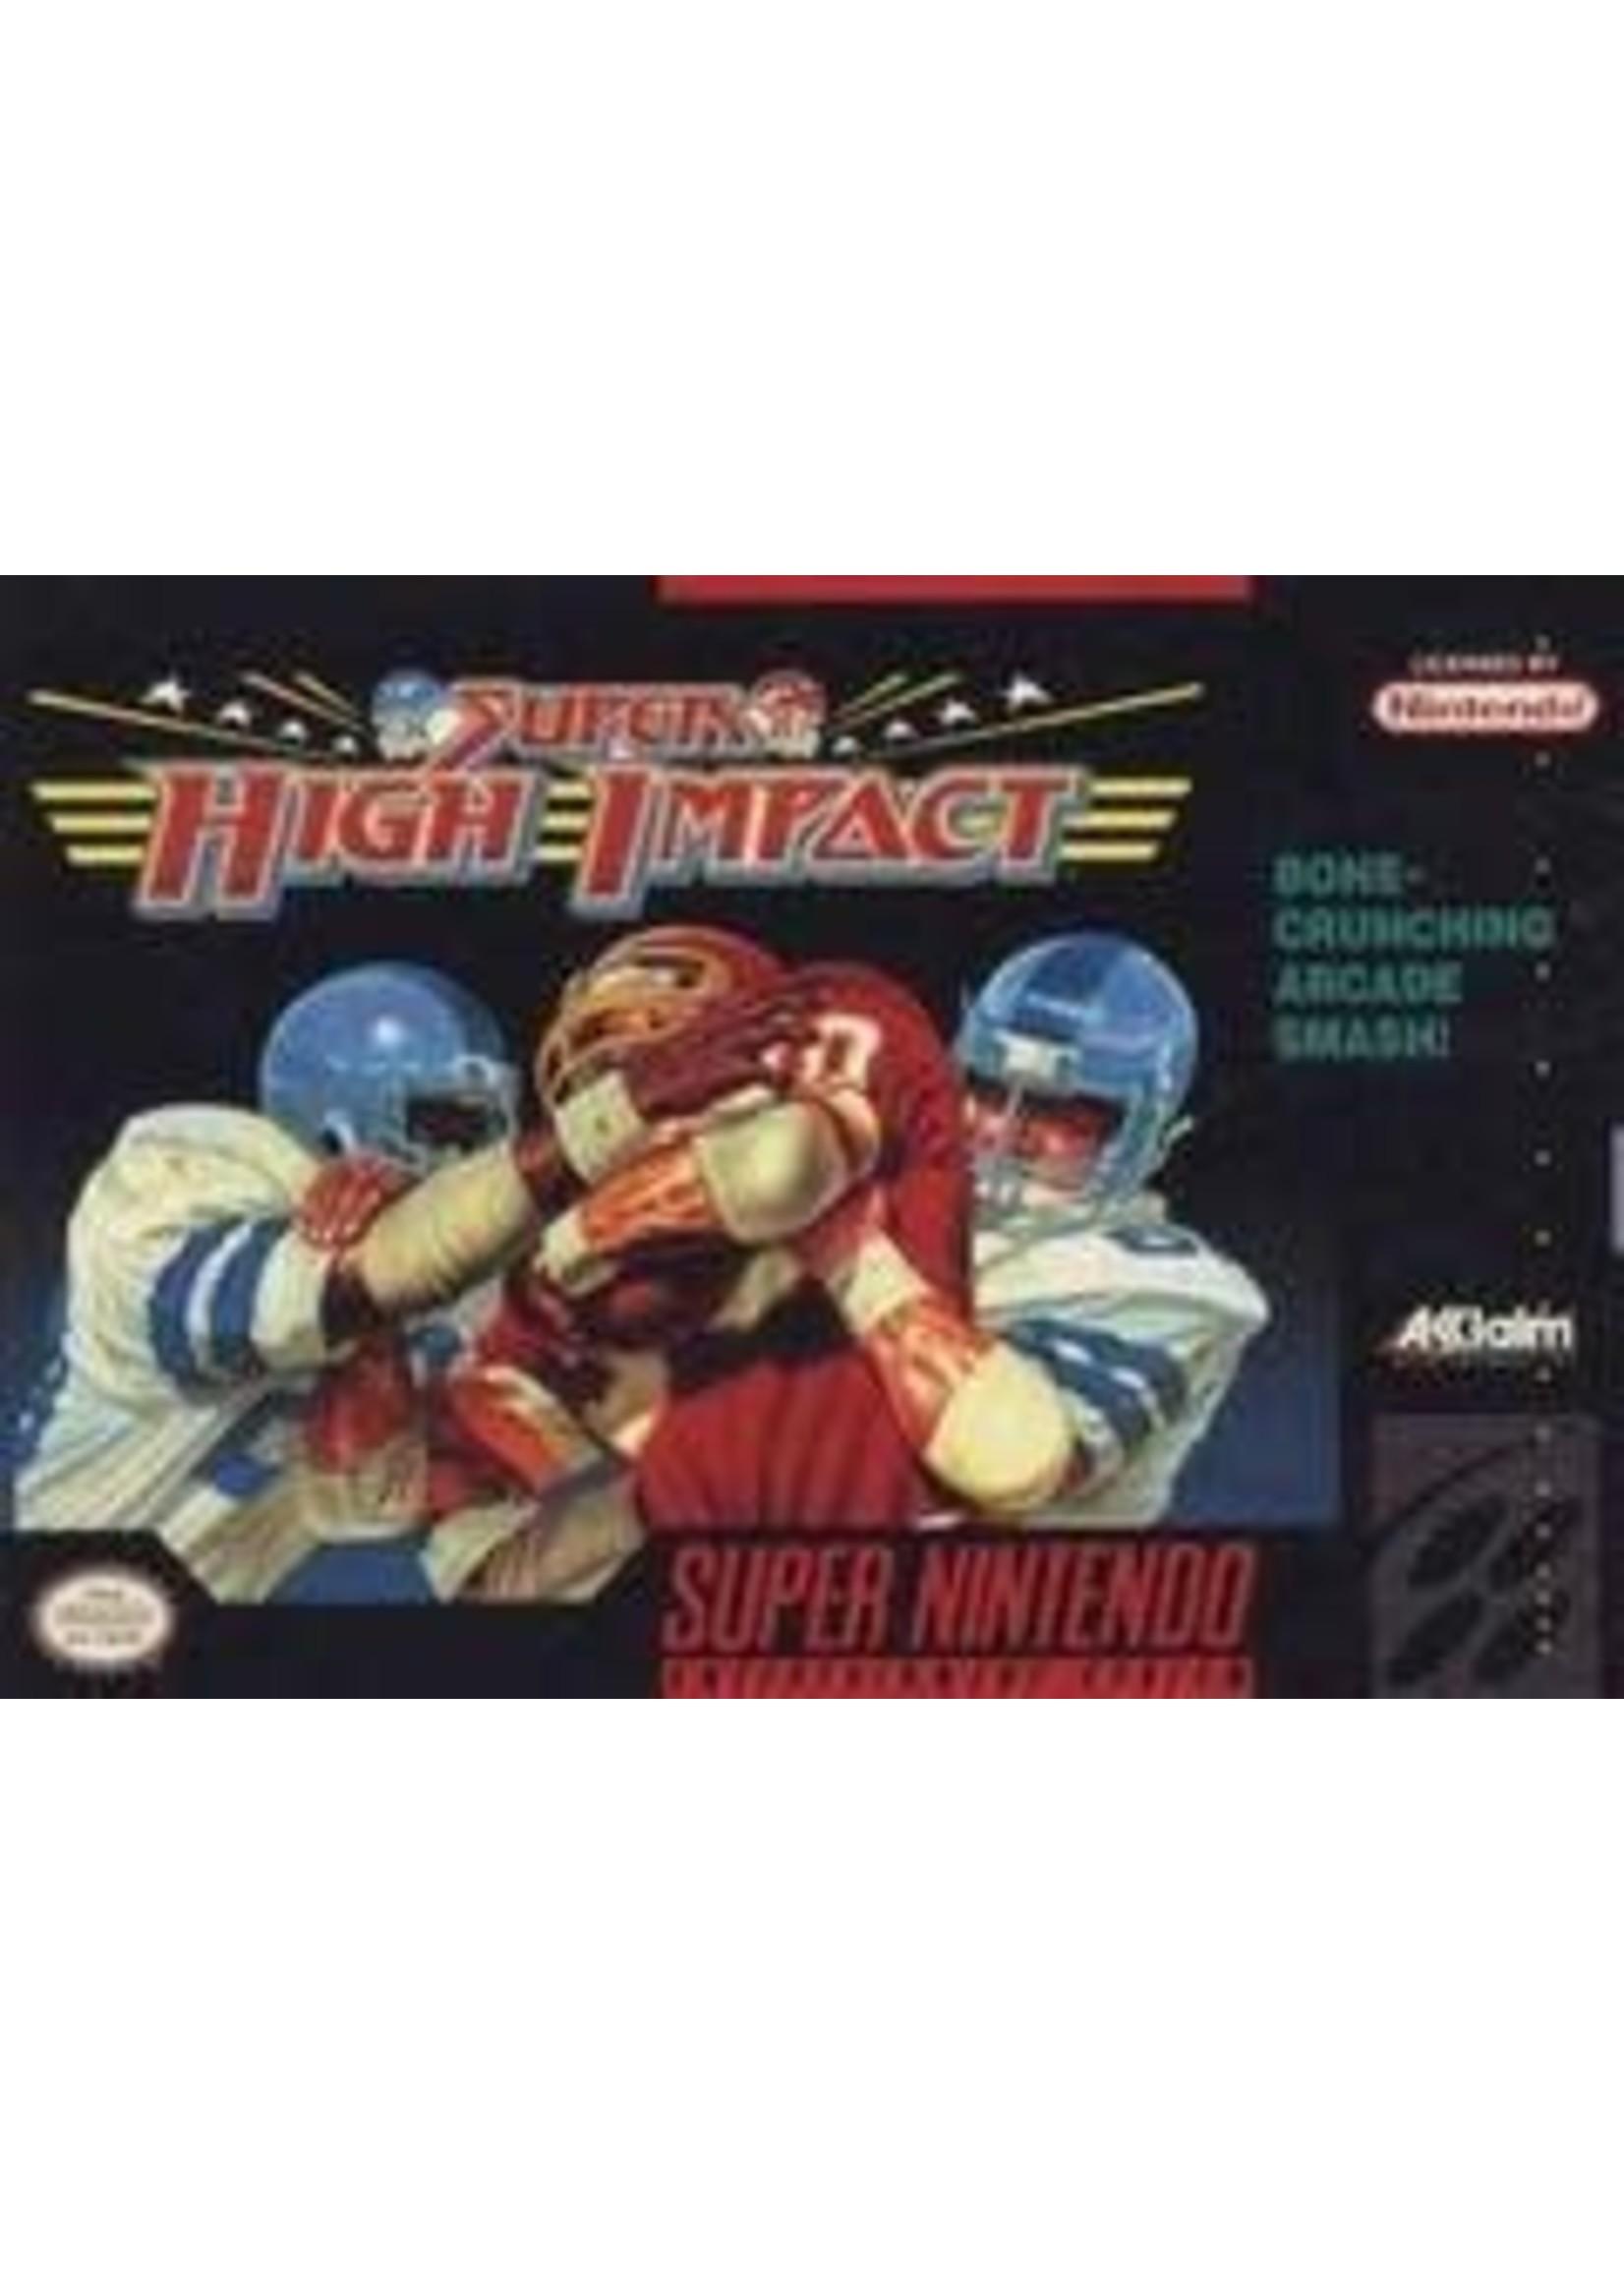 Super High Impact Super Nintendo